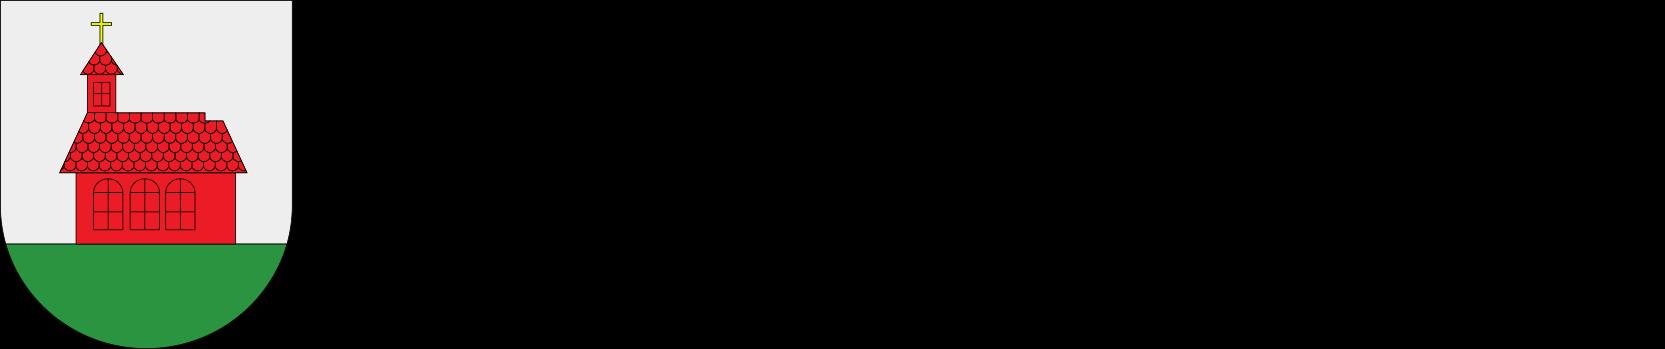 Sitzenkirch